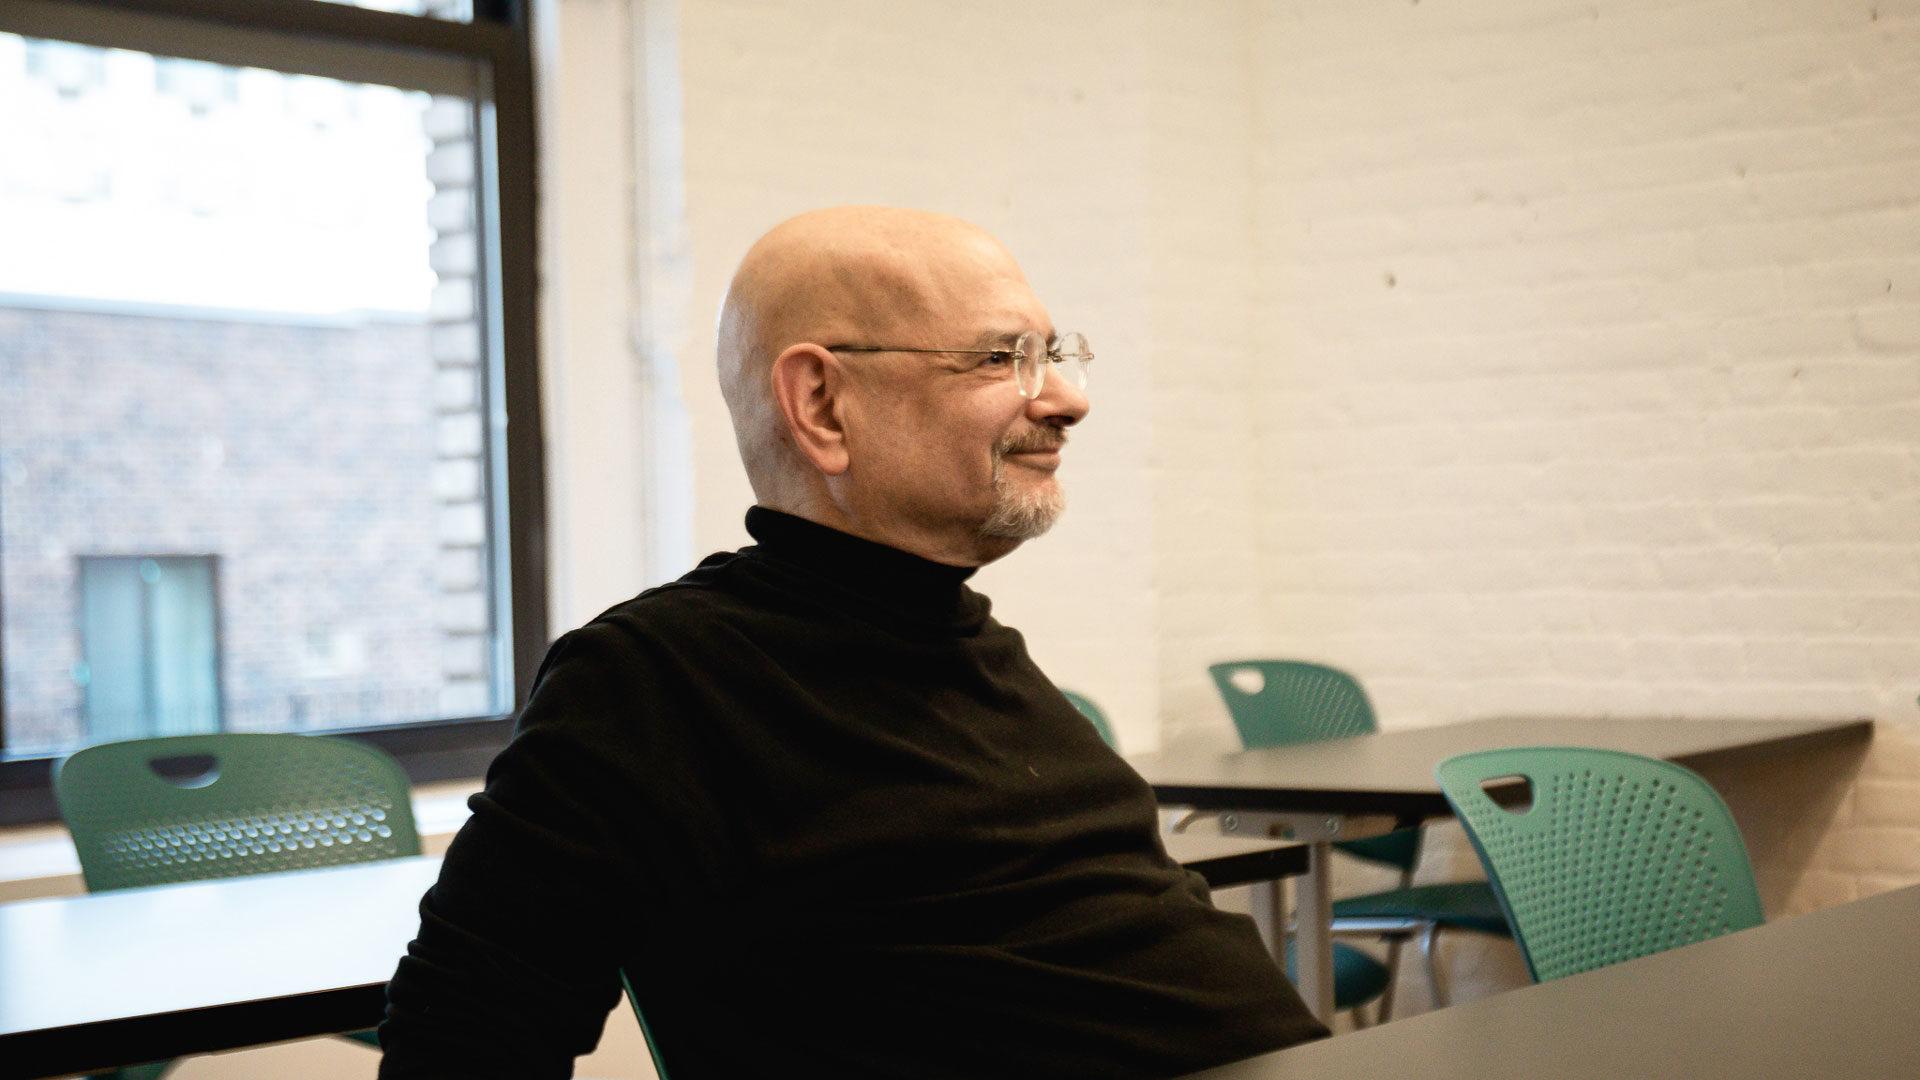 Steven Heller weaning glasses and black turtleneck, smiling in MFAD classroom